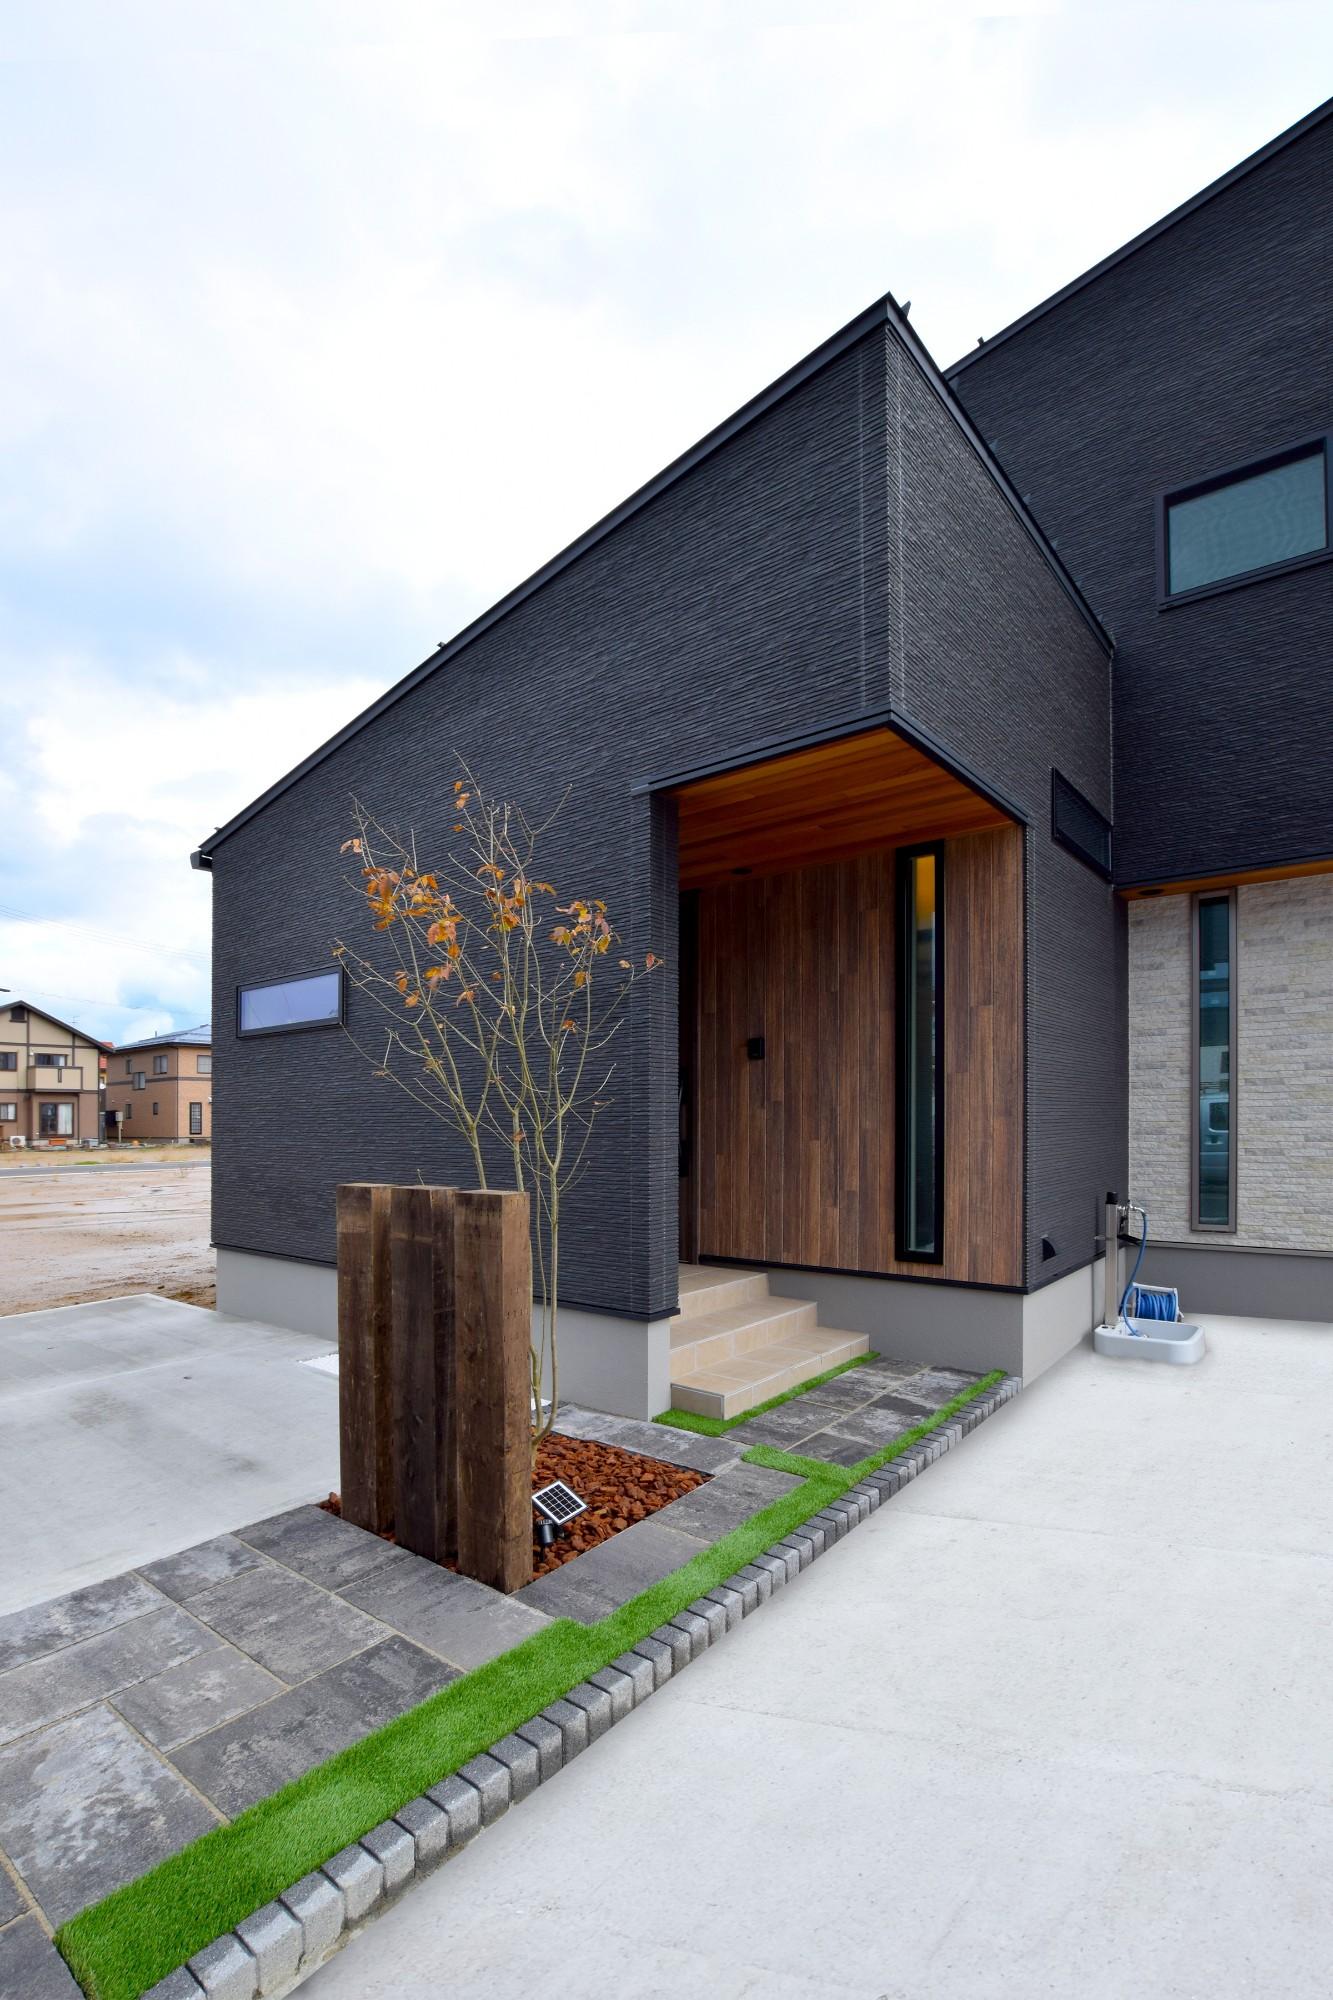 DETAIL HOME(ディテールホーム)「和と洋の溶け合う心地いい暮らし」の和風・和モダンな外観の実例写真